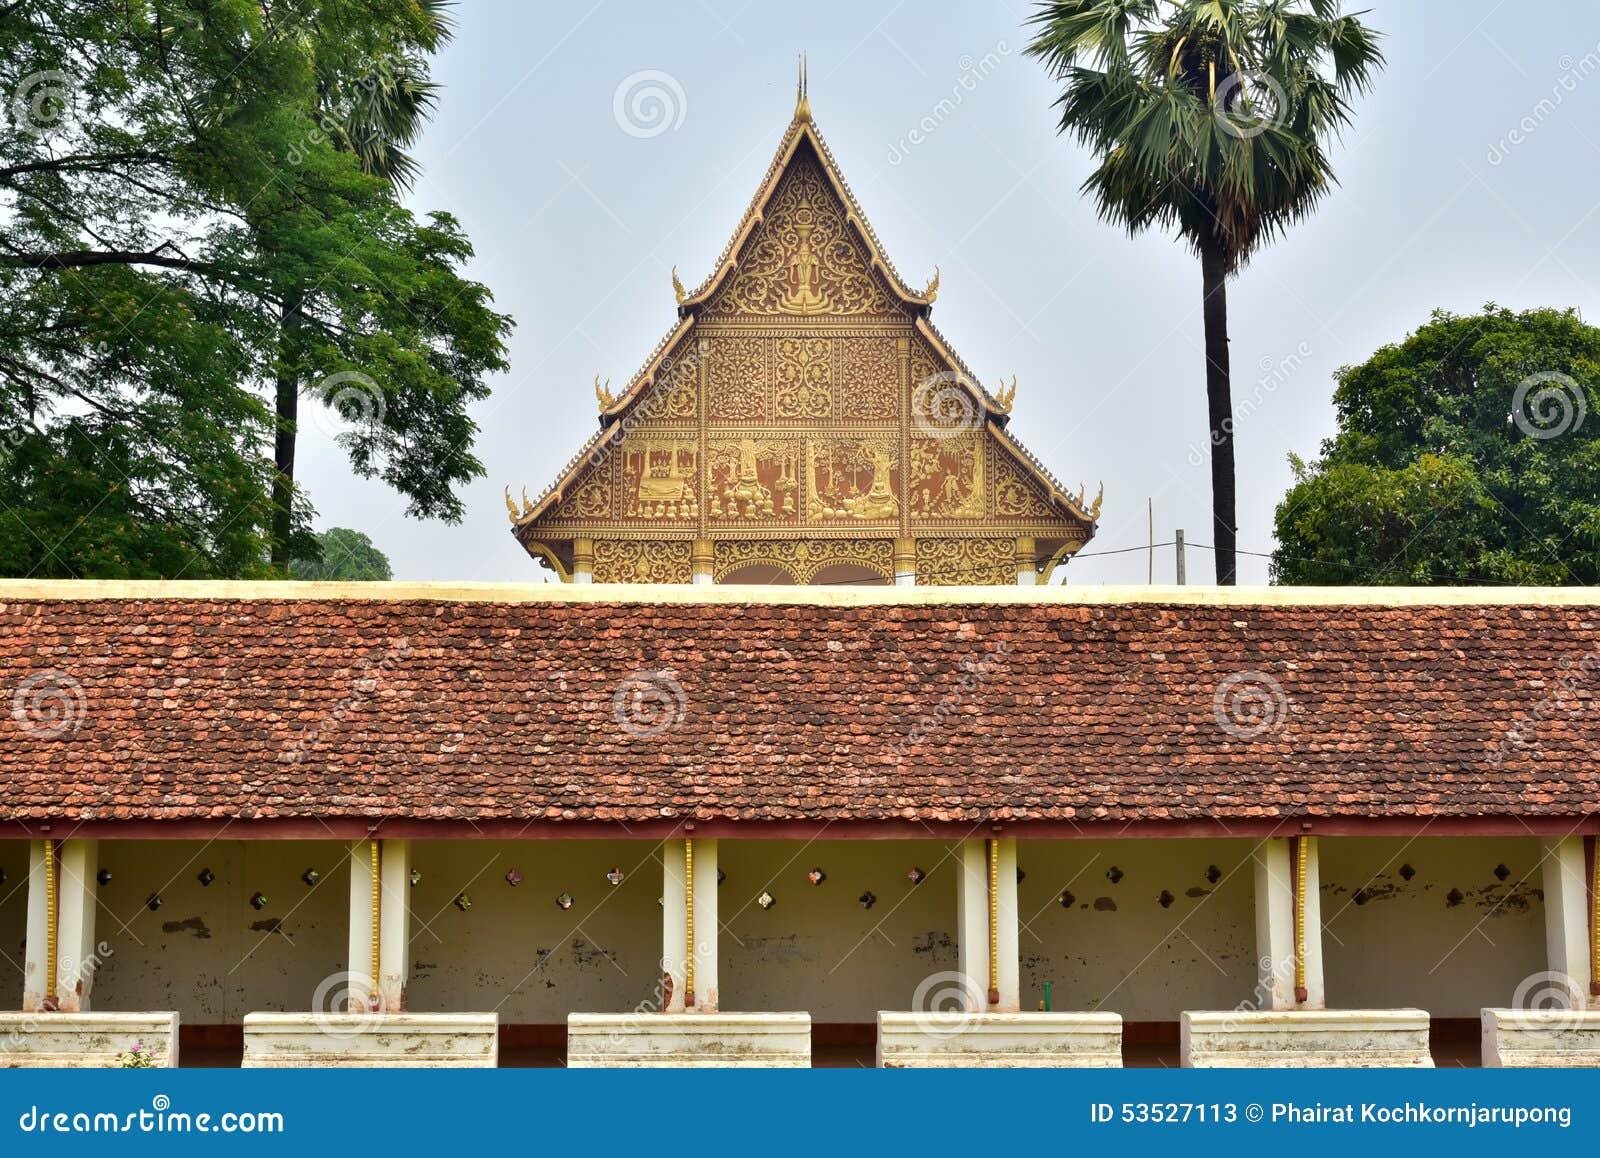 Temple atmosphere